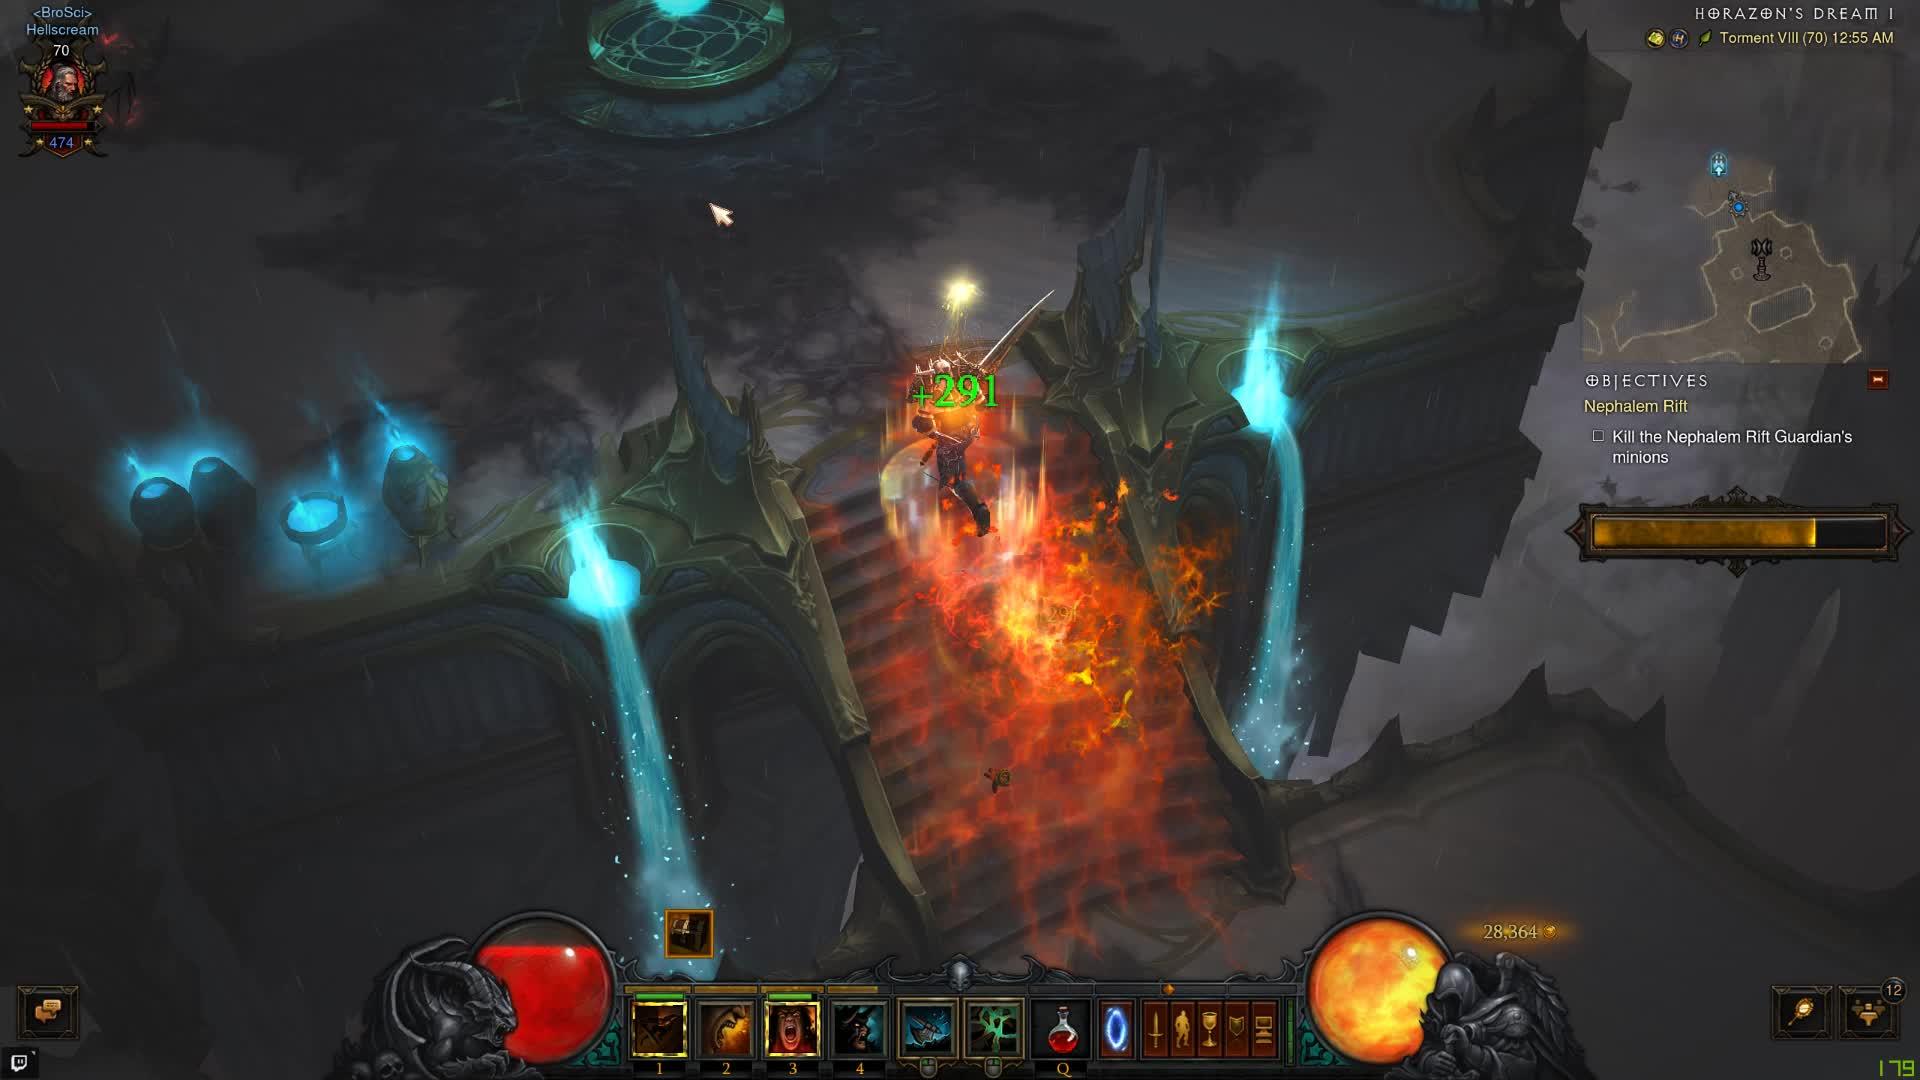 pathofexile, Diablo III GoblOWNED GIFs